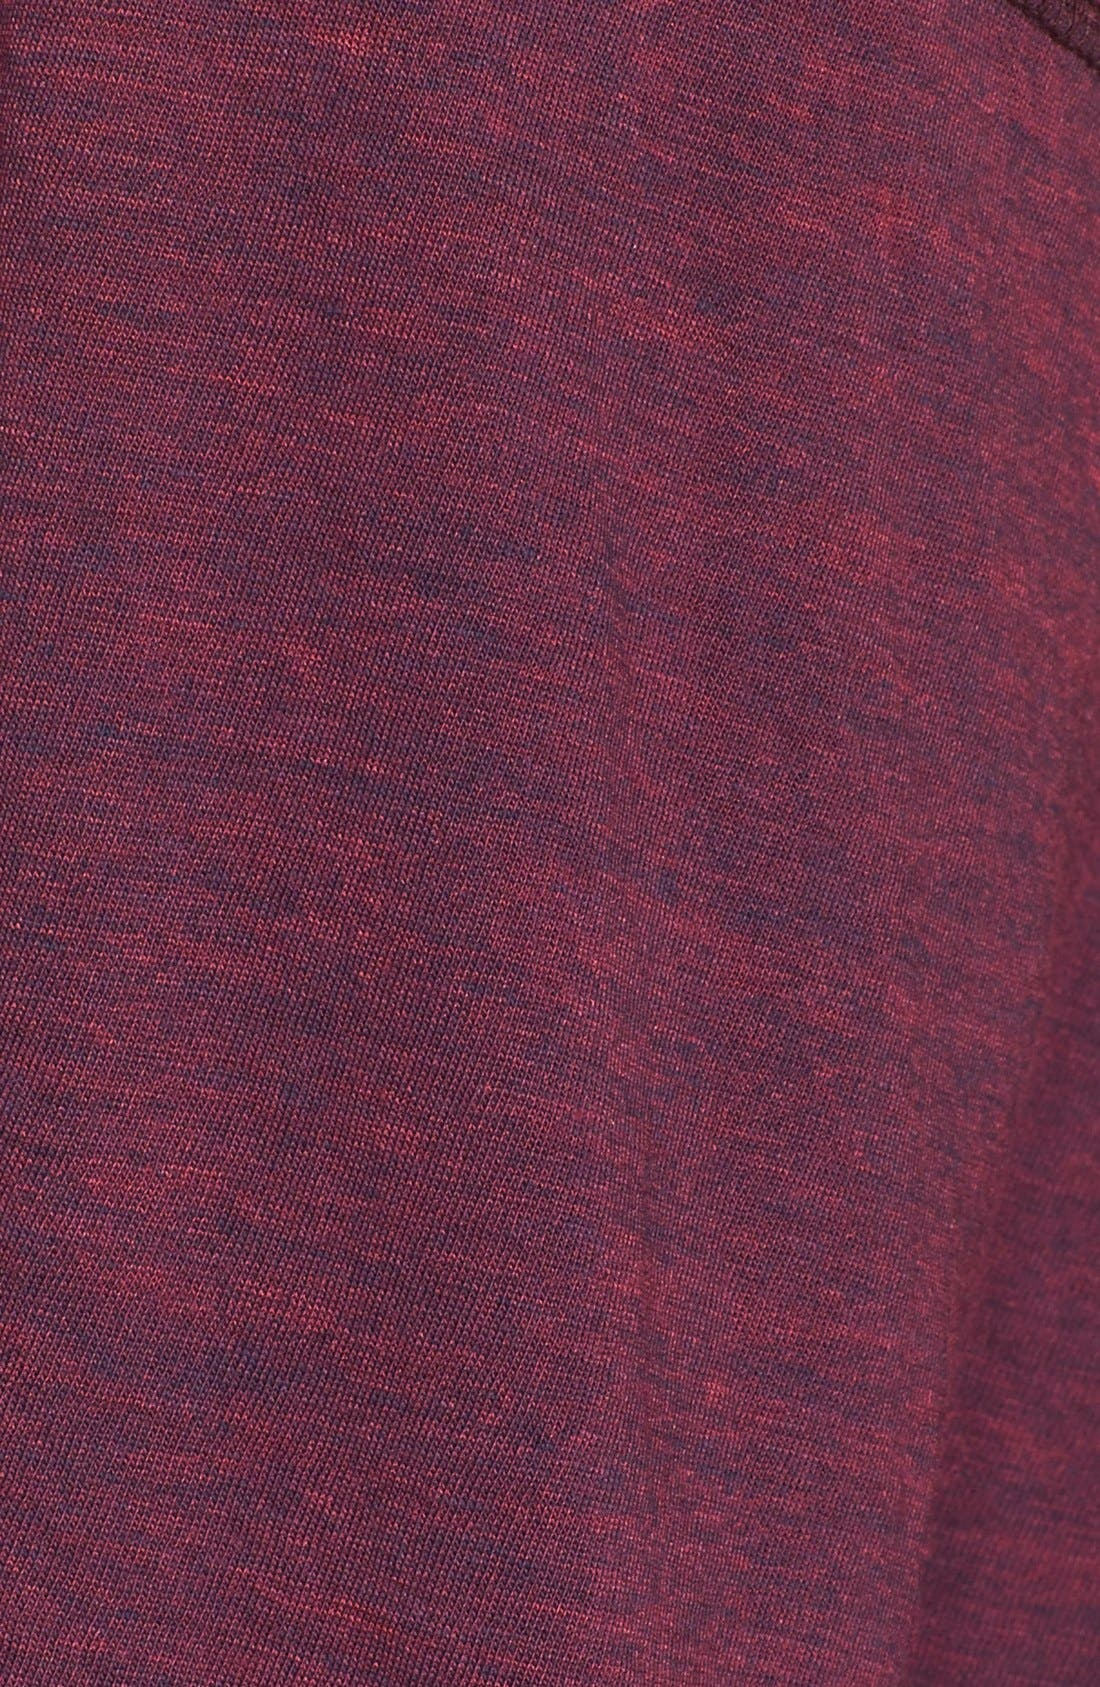 Alternate Image 3  - Free People 'Breezy' Seam Detail Slub Knit Tank